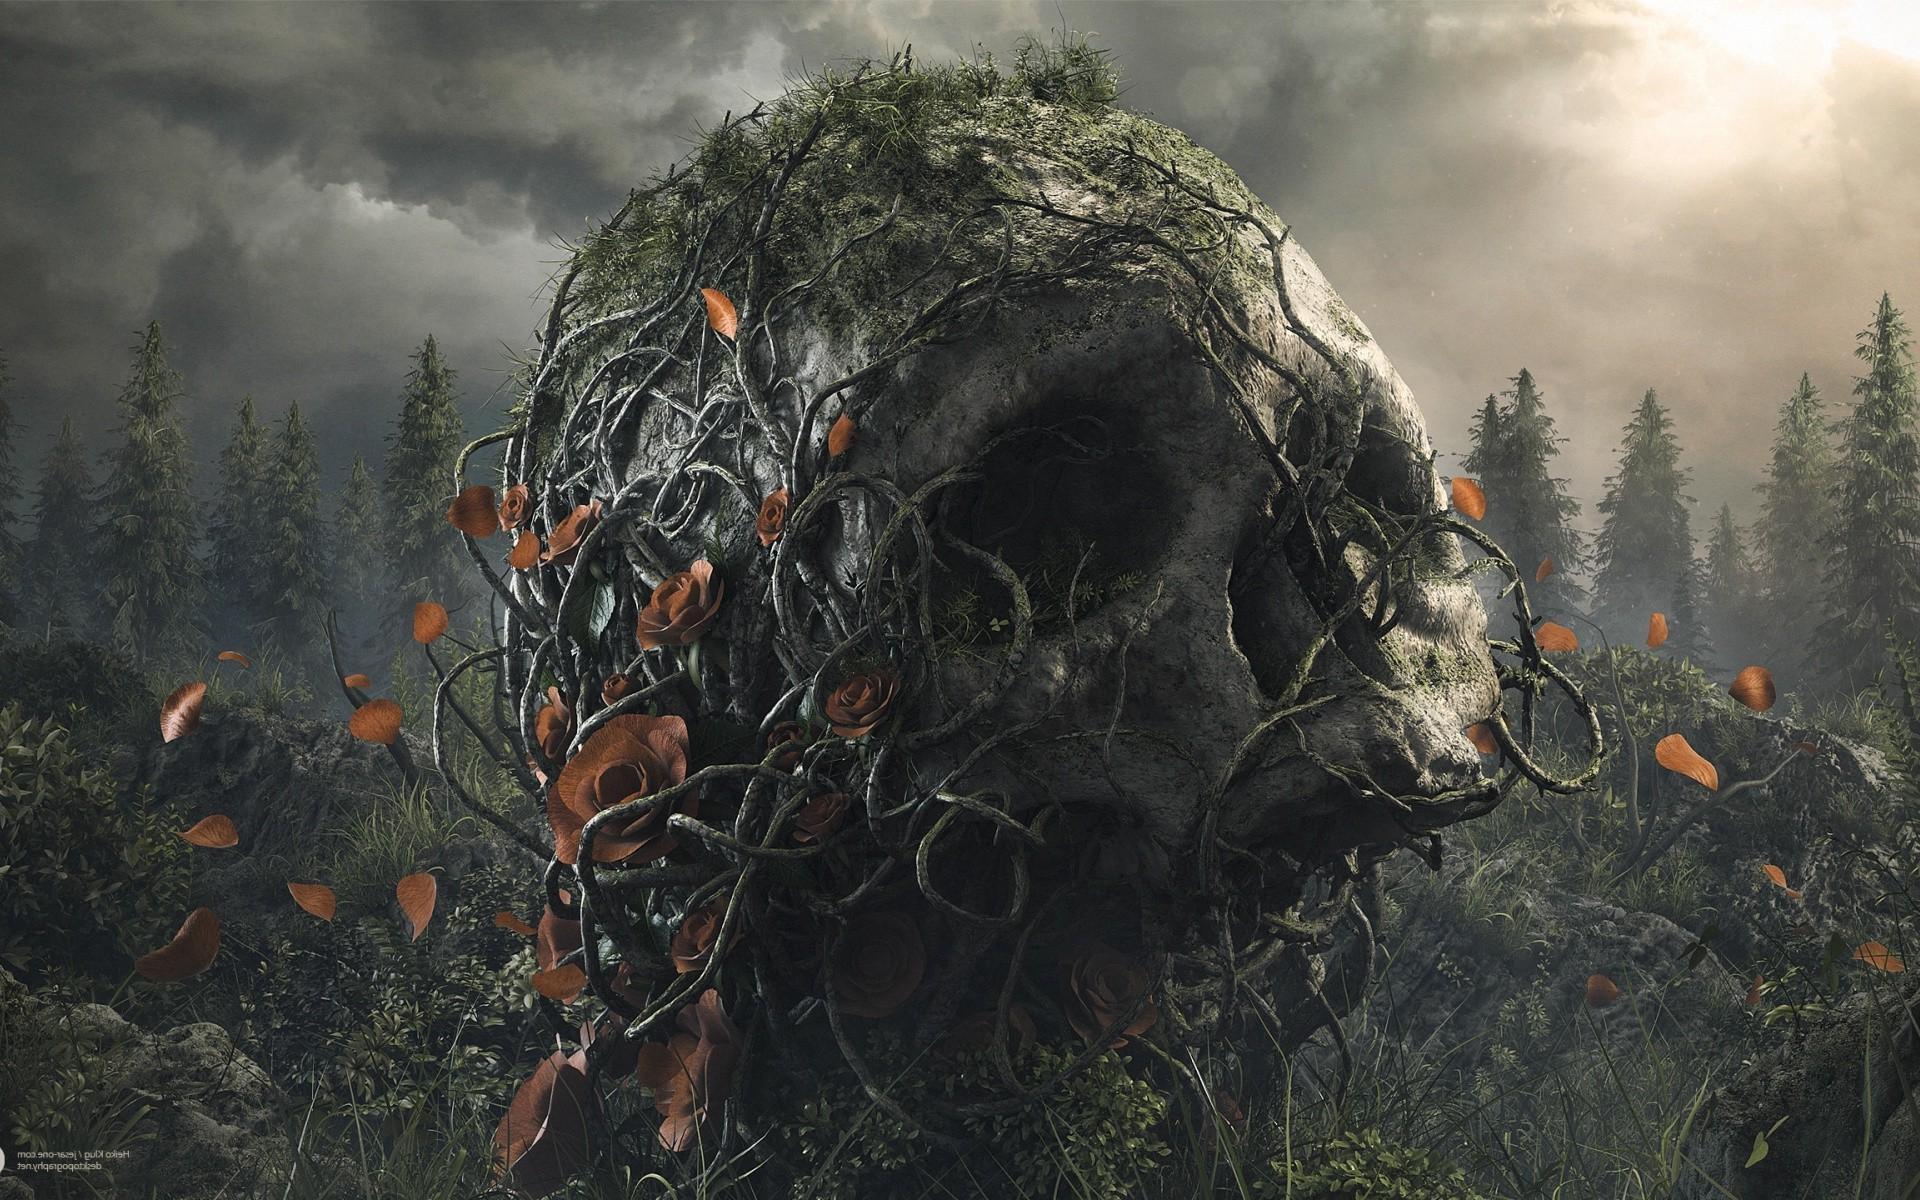 Trees Forest Digital Art Dark Flowers Nature Plants Artwork Clouds Soldier Petals Rose Skull Roots Desktopography